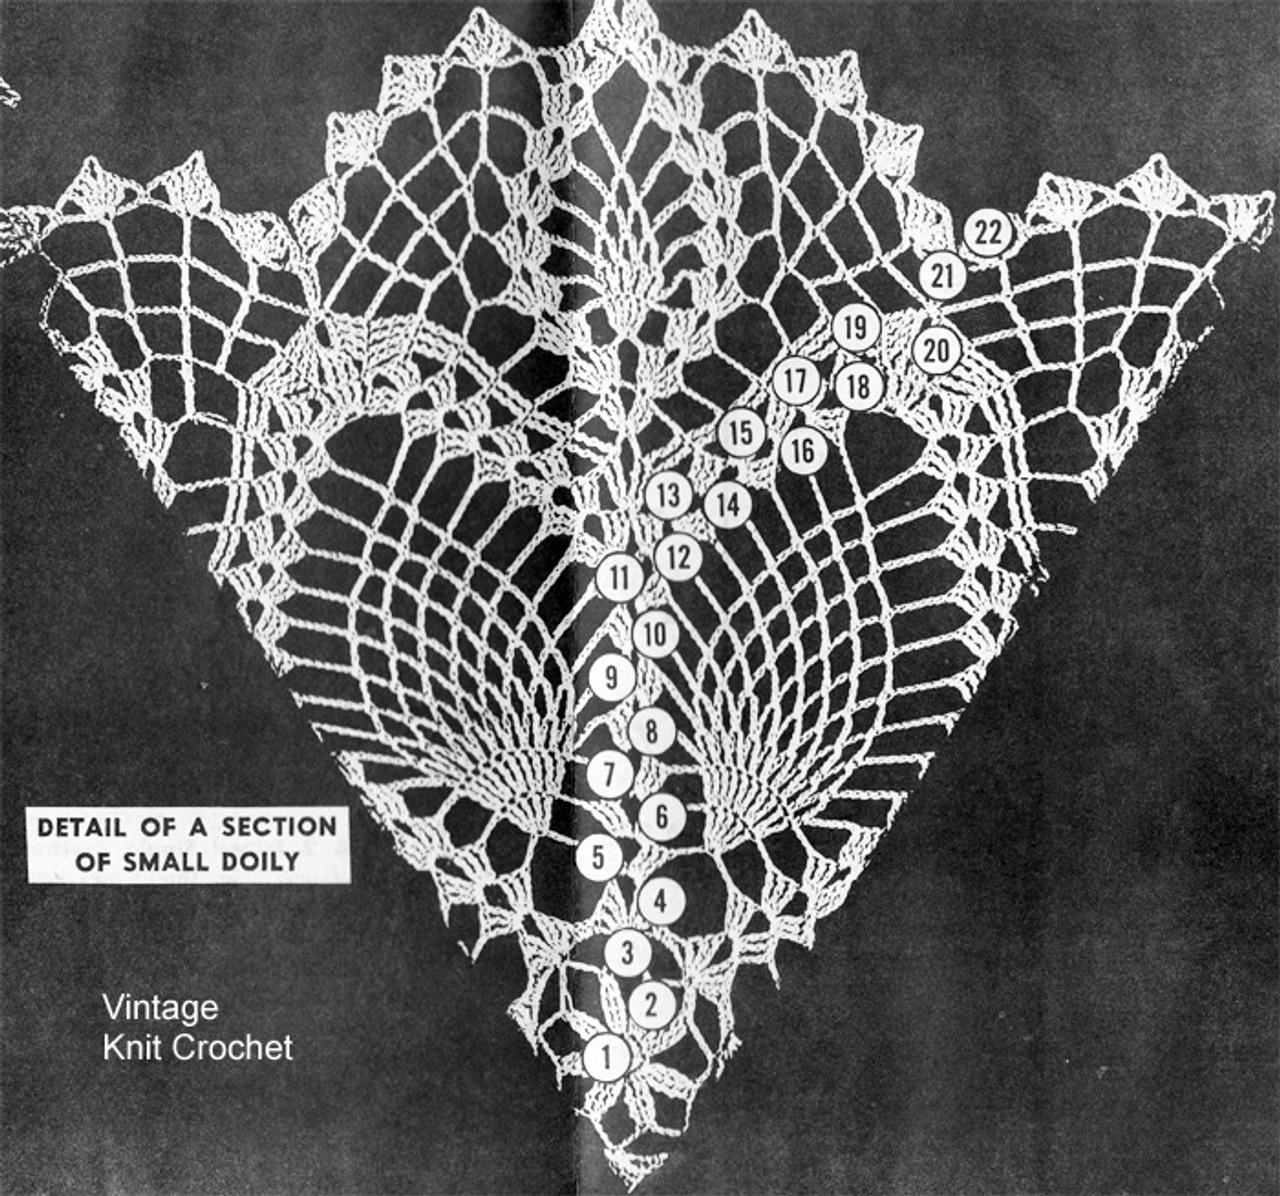 Small Doily Pattern Stitch Illustration